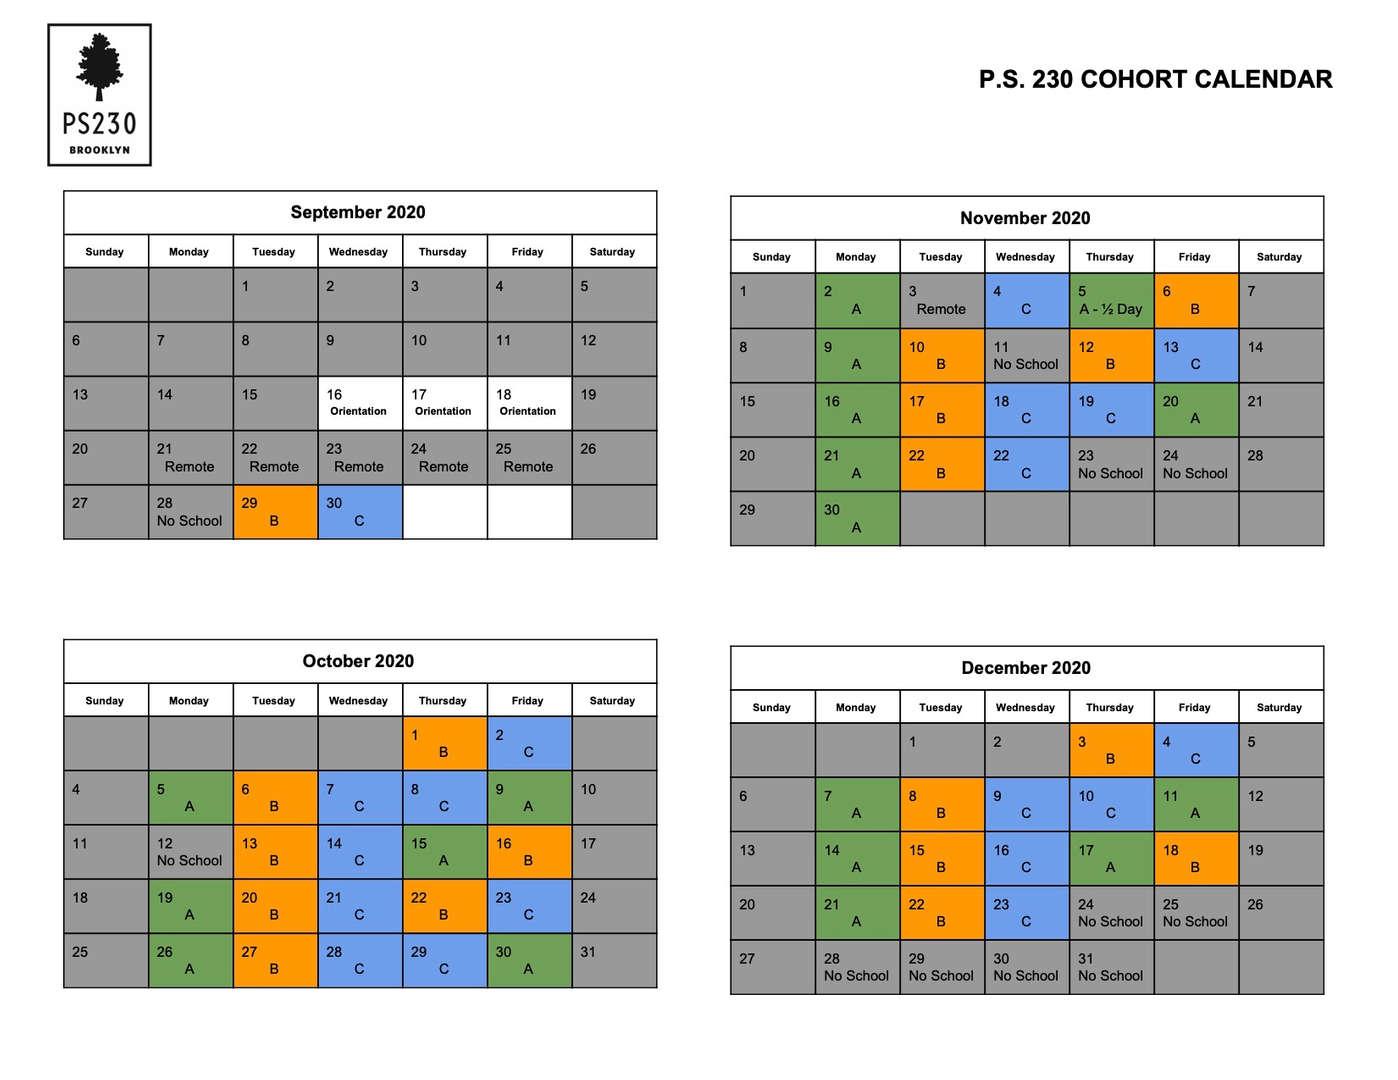 PS 230 Cohort Calendar - Fall 2020